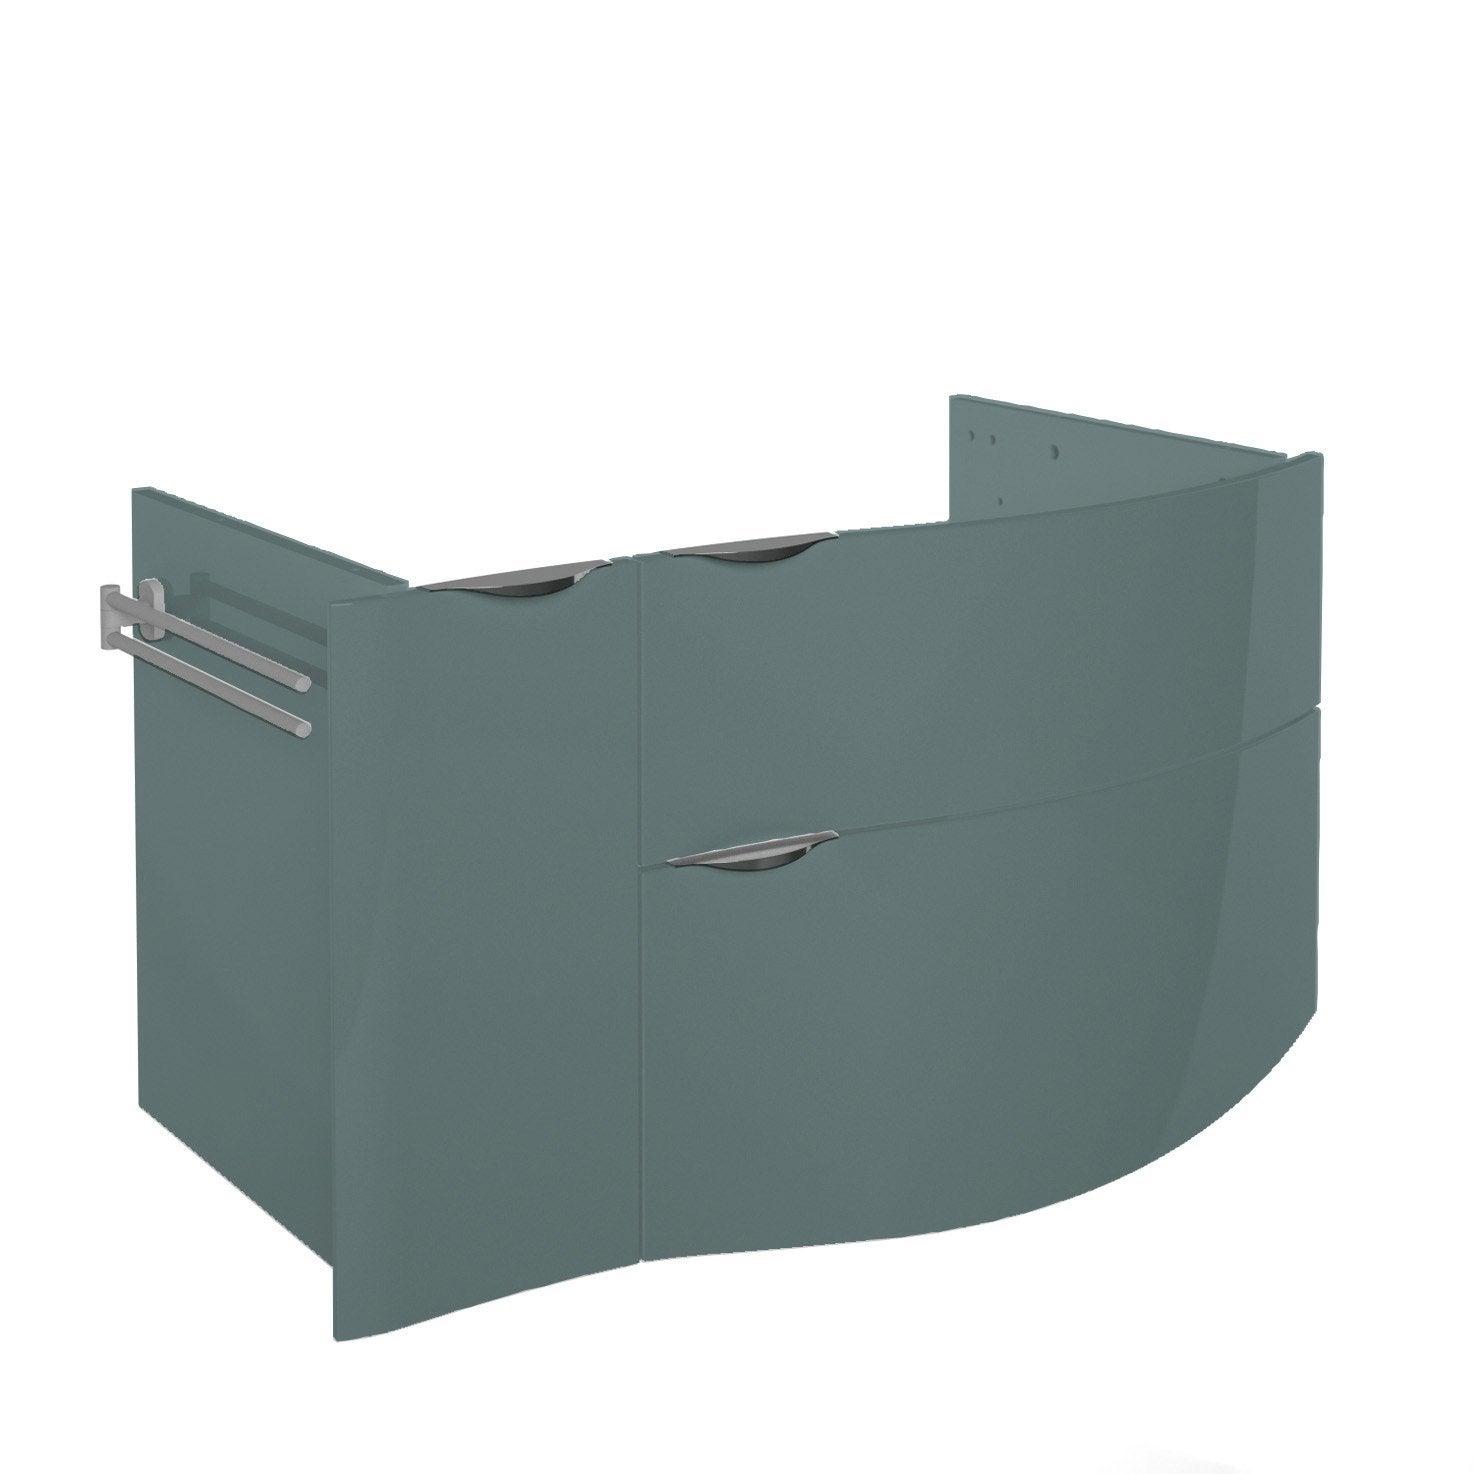 meuble sous vasque x x cm vert elegance leroy merlin. Black Bedroom Furniture Sets. Home Design Ideas